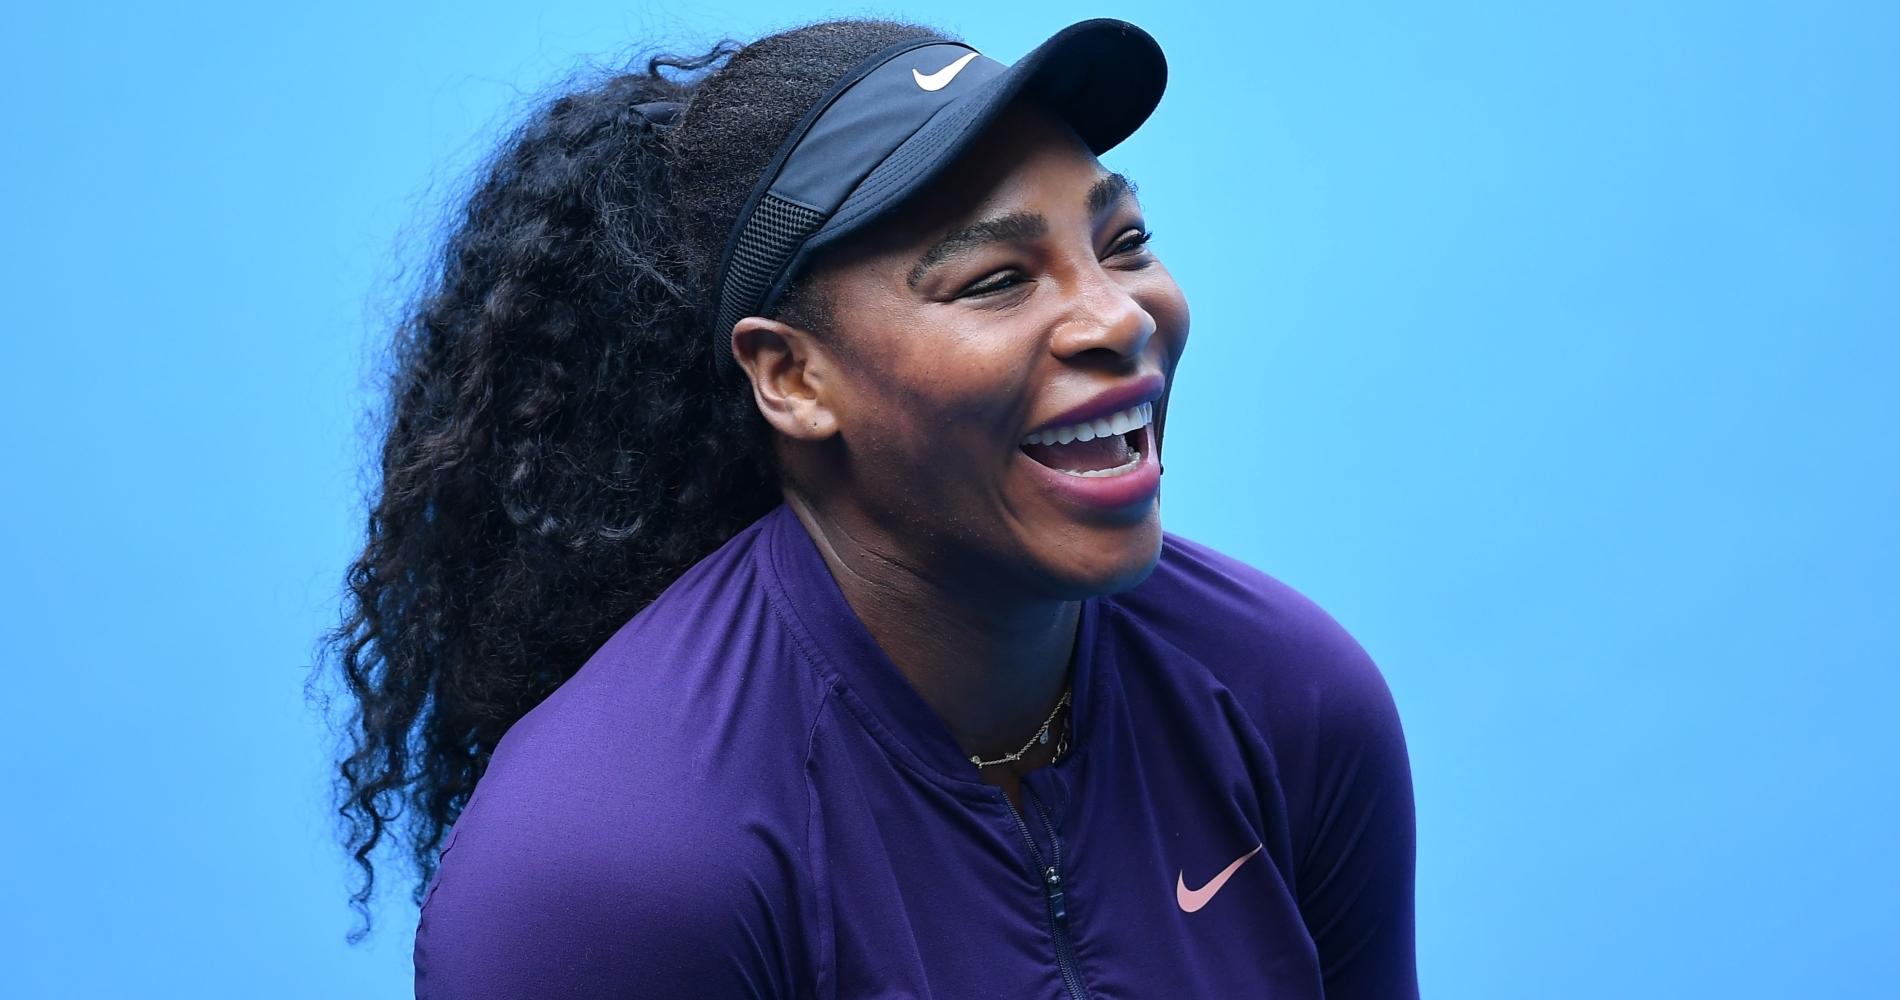 Serena Williams before 2020 Australian Open